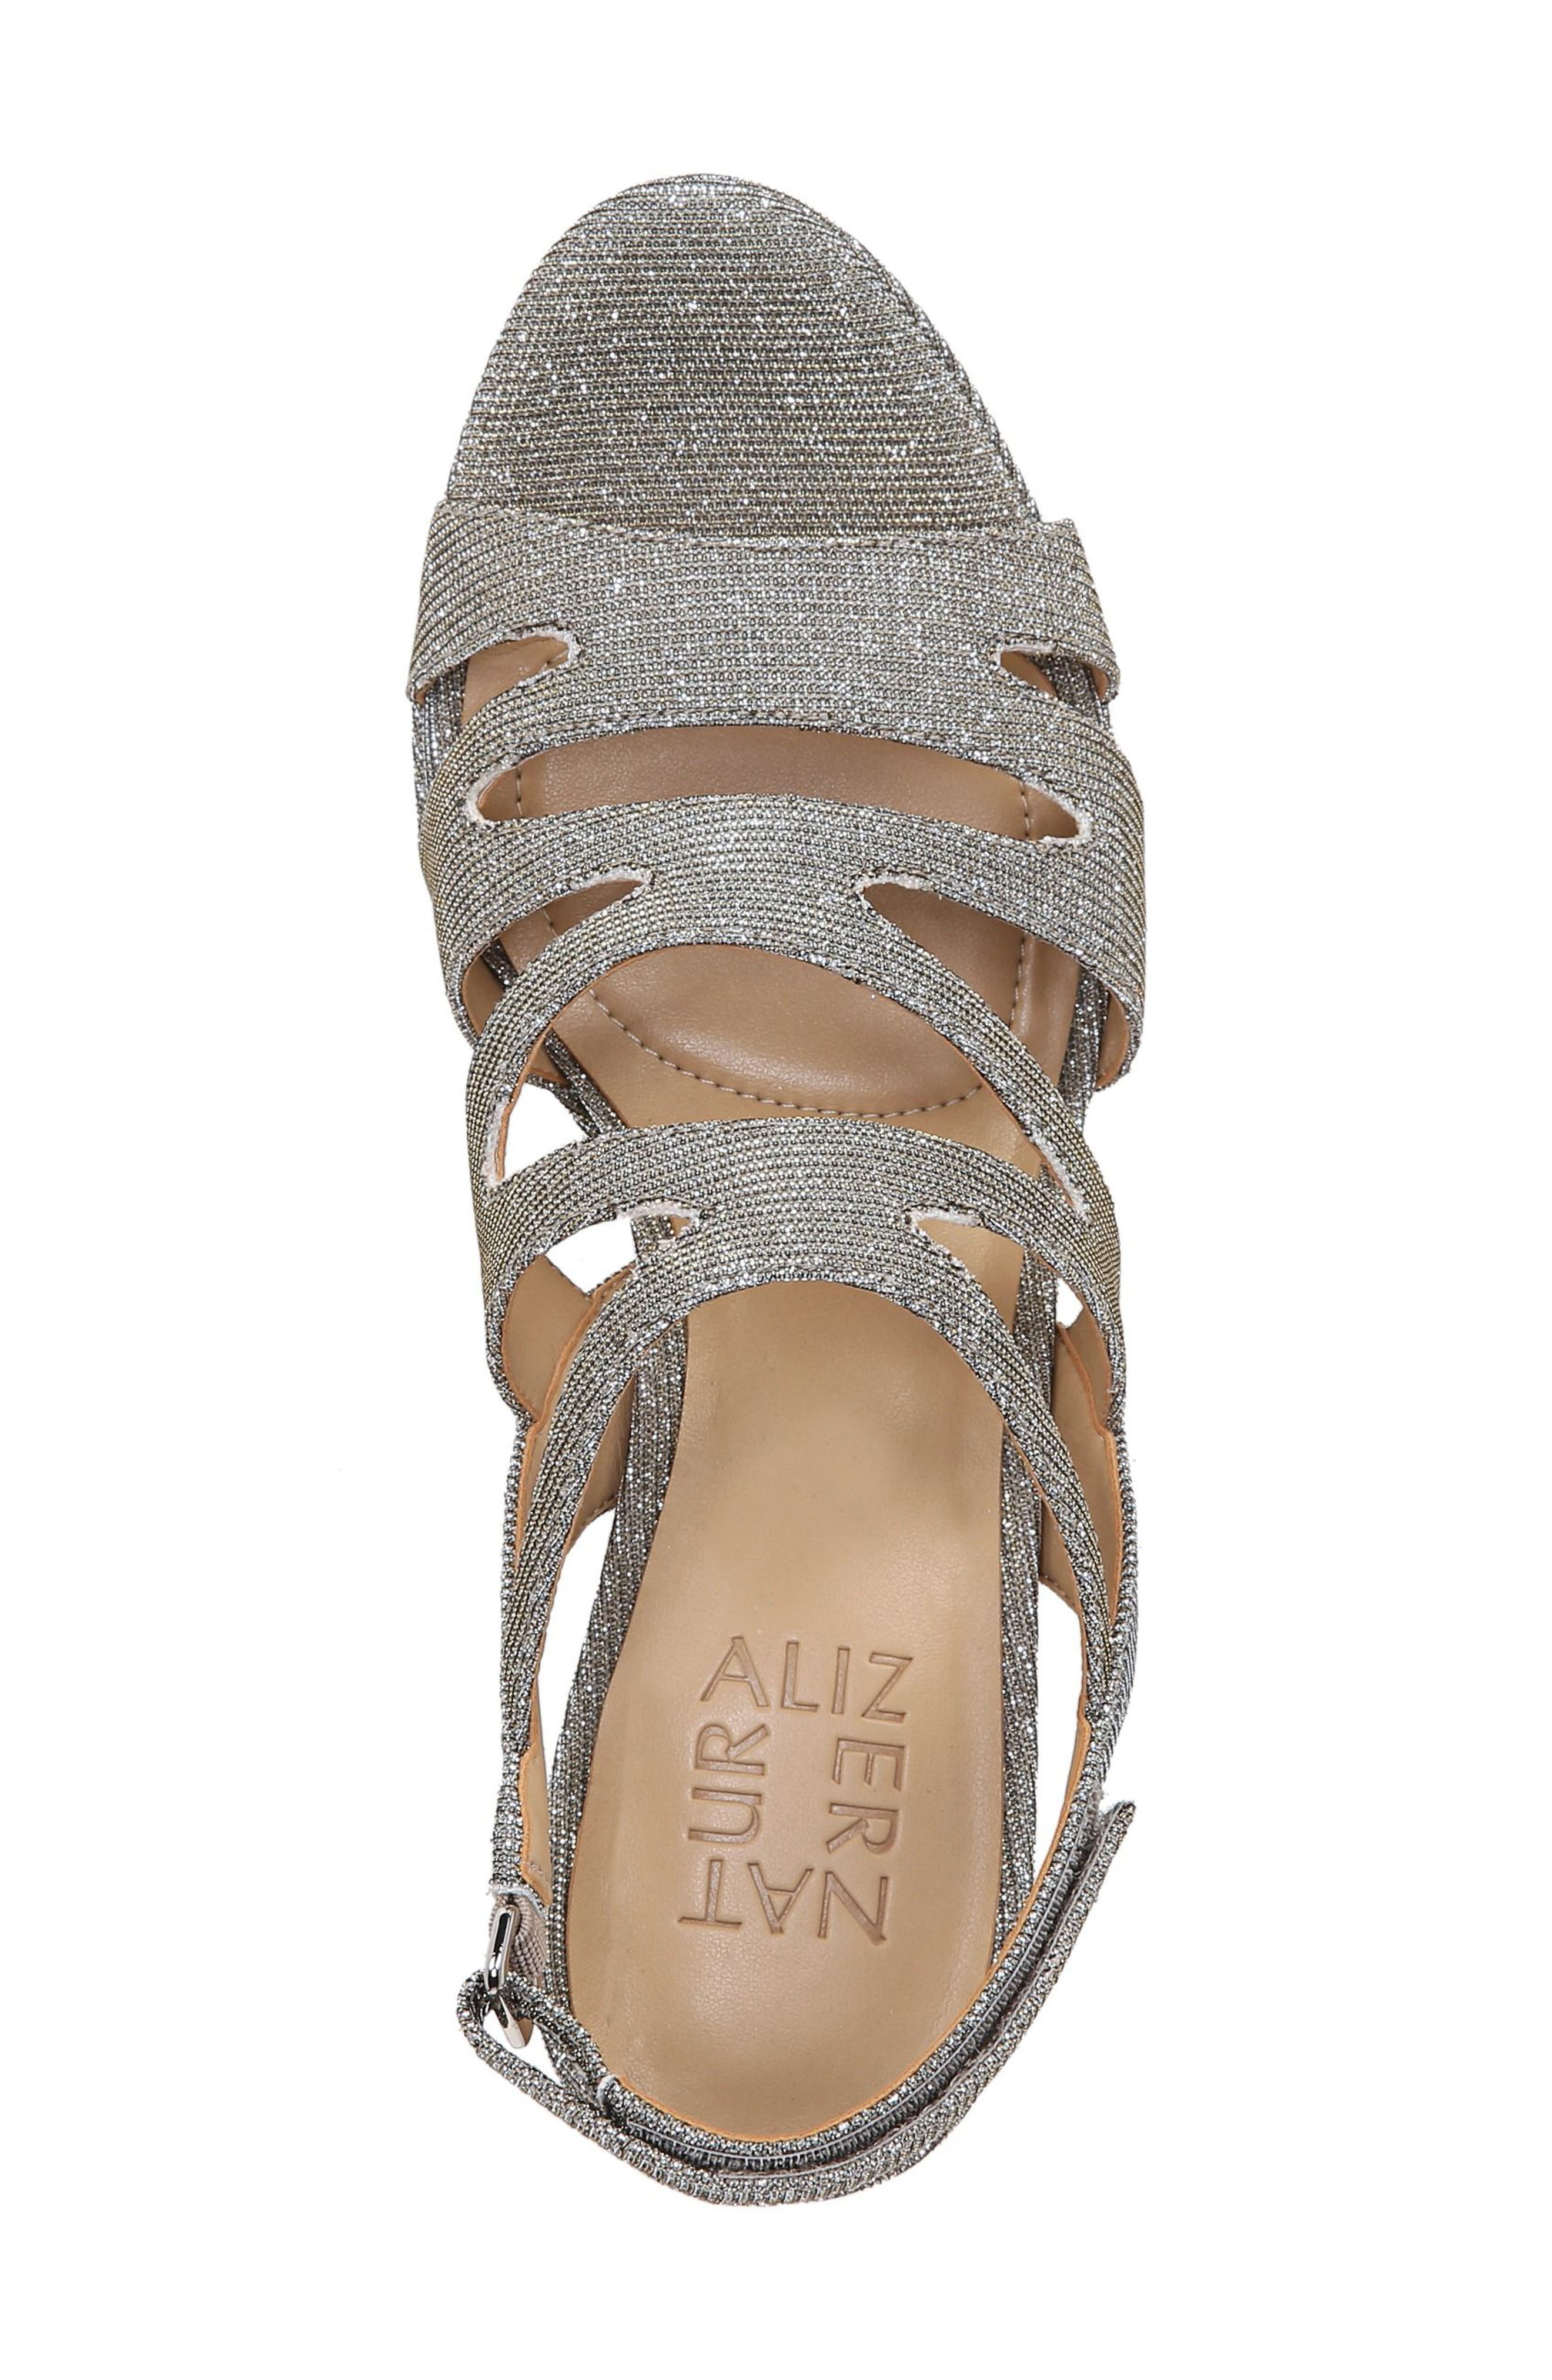 'Pressley' Slingback Platform Sandal,                             Alternate thumbnail 5, color,                             043